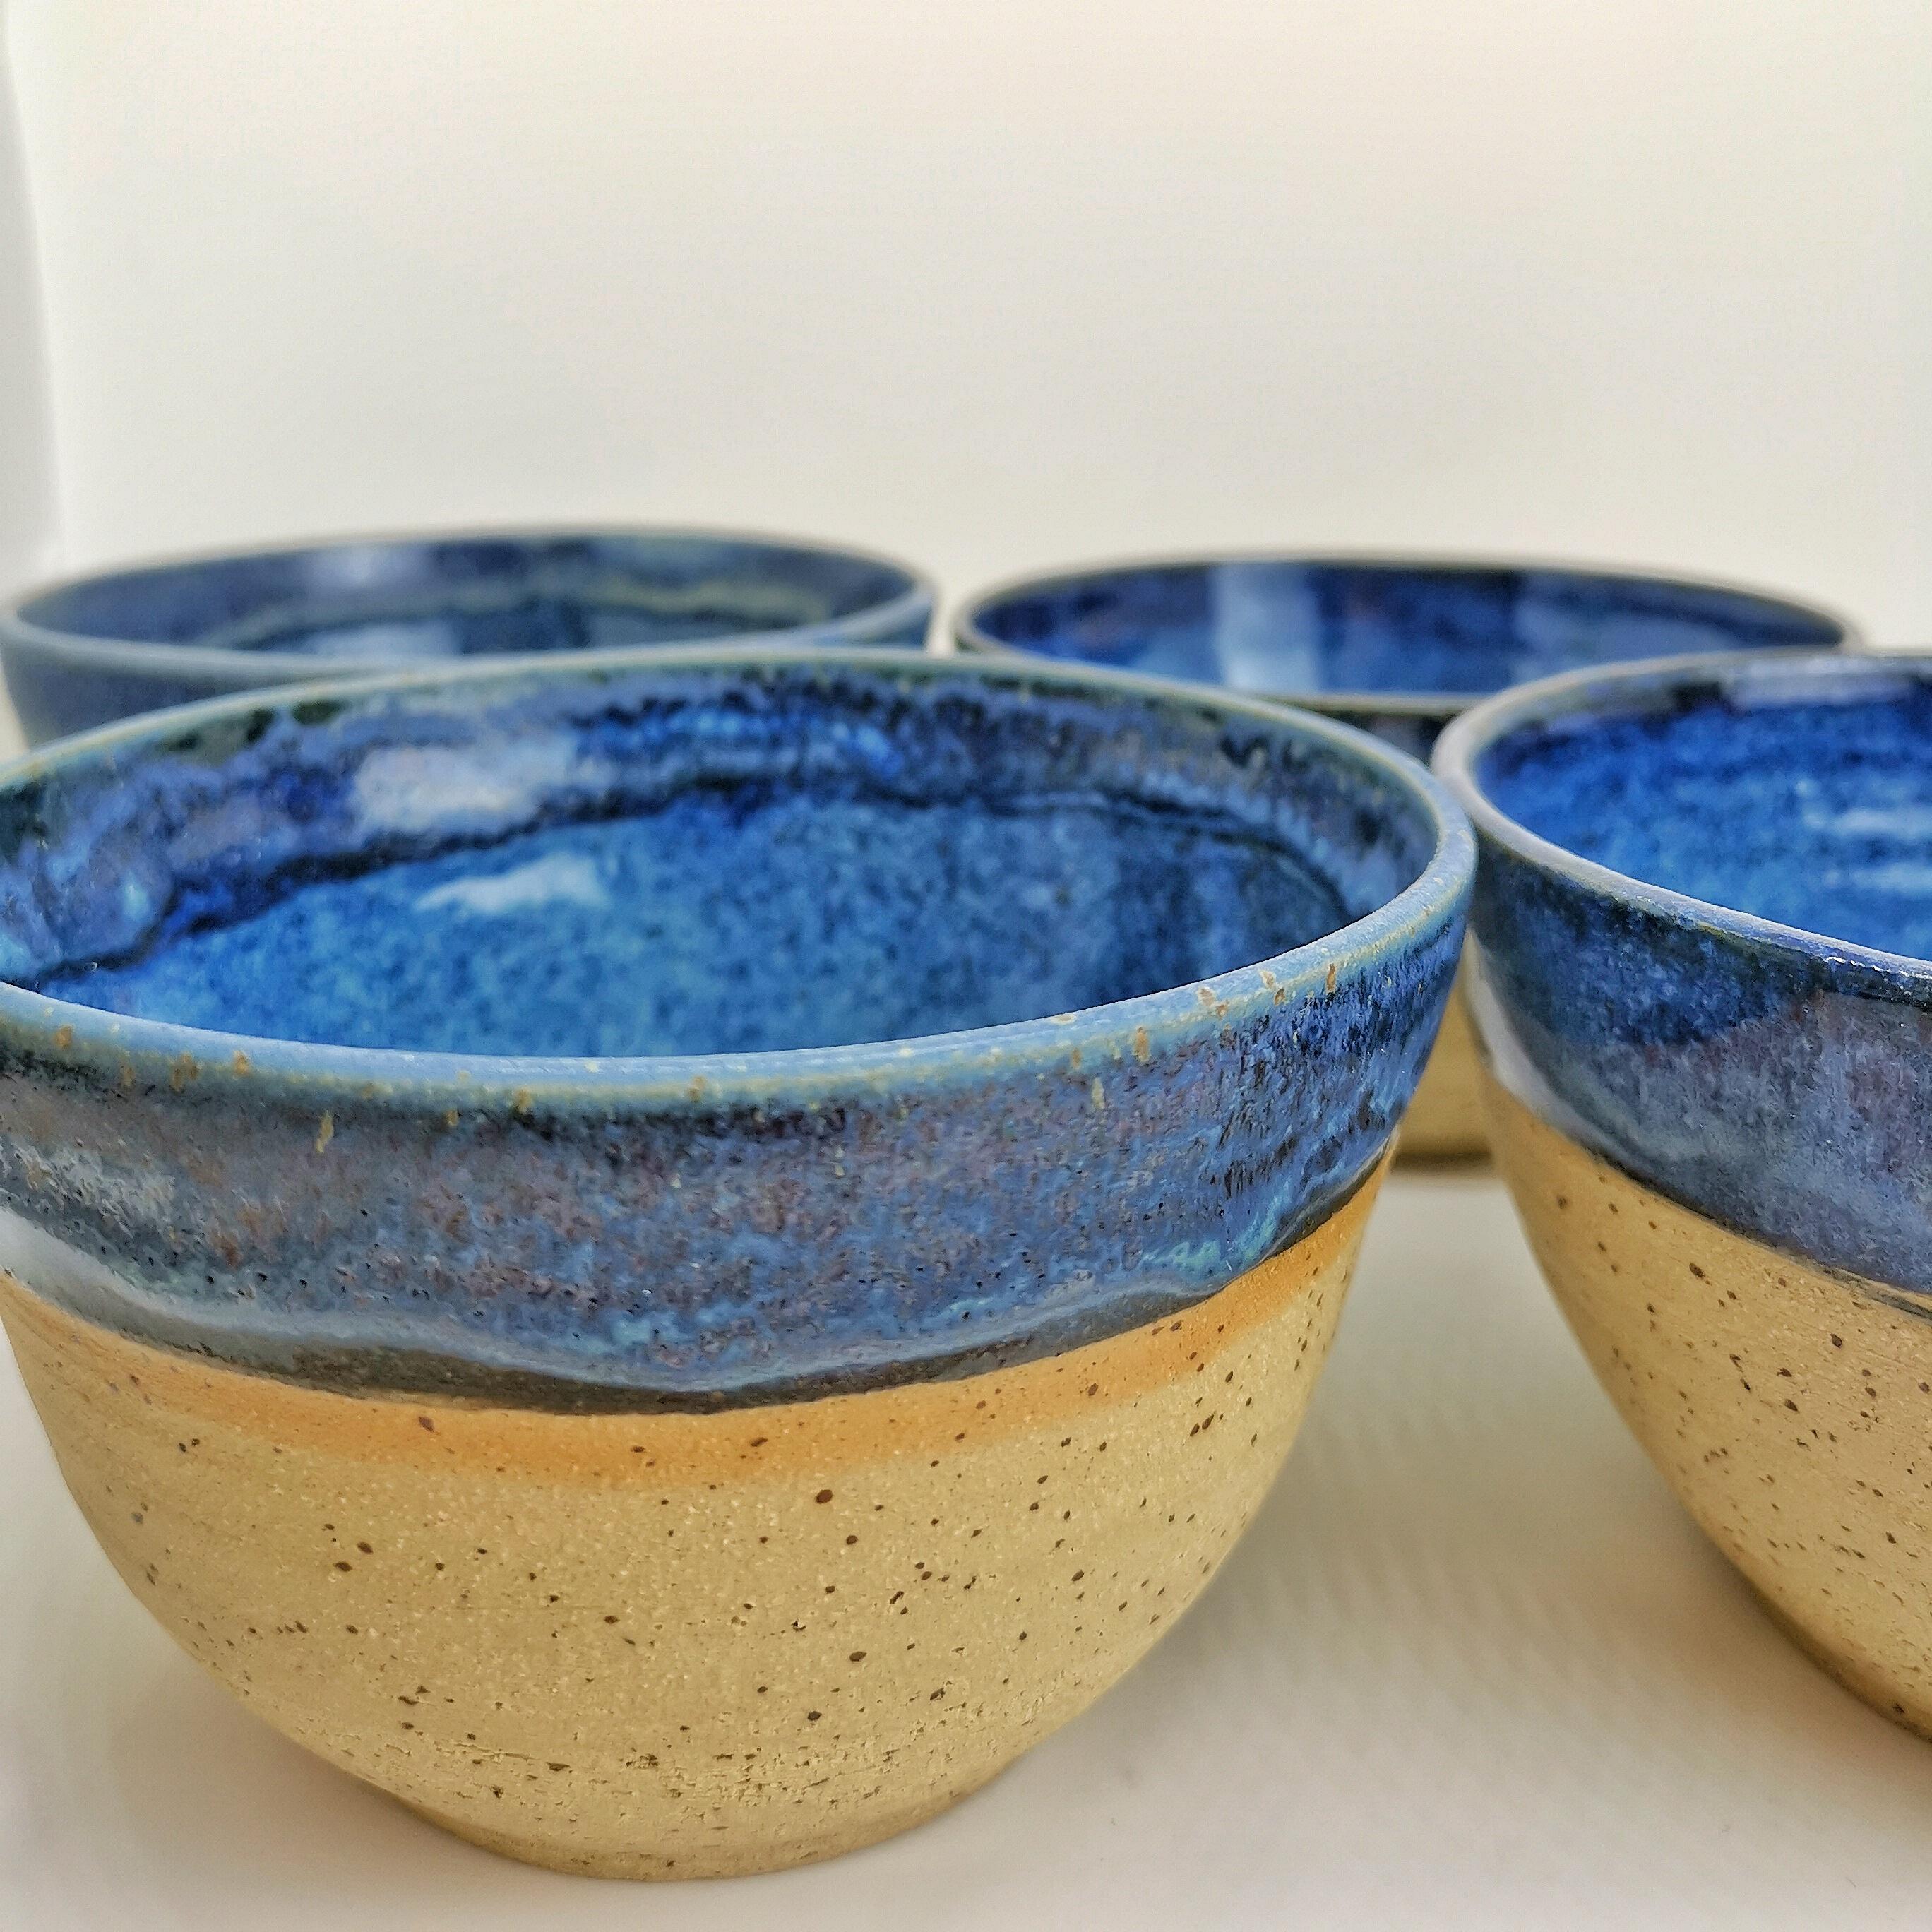 Bowls blau Natur von Keramik-Atelier Brigitte Lang in Rauenberg